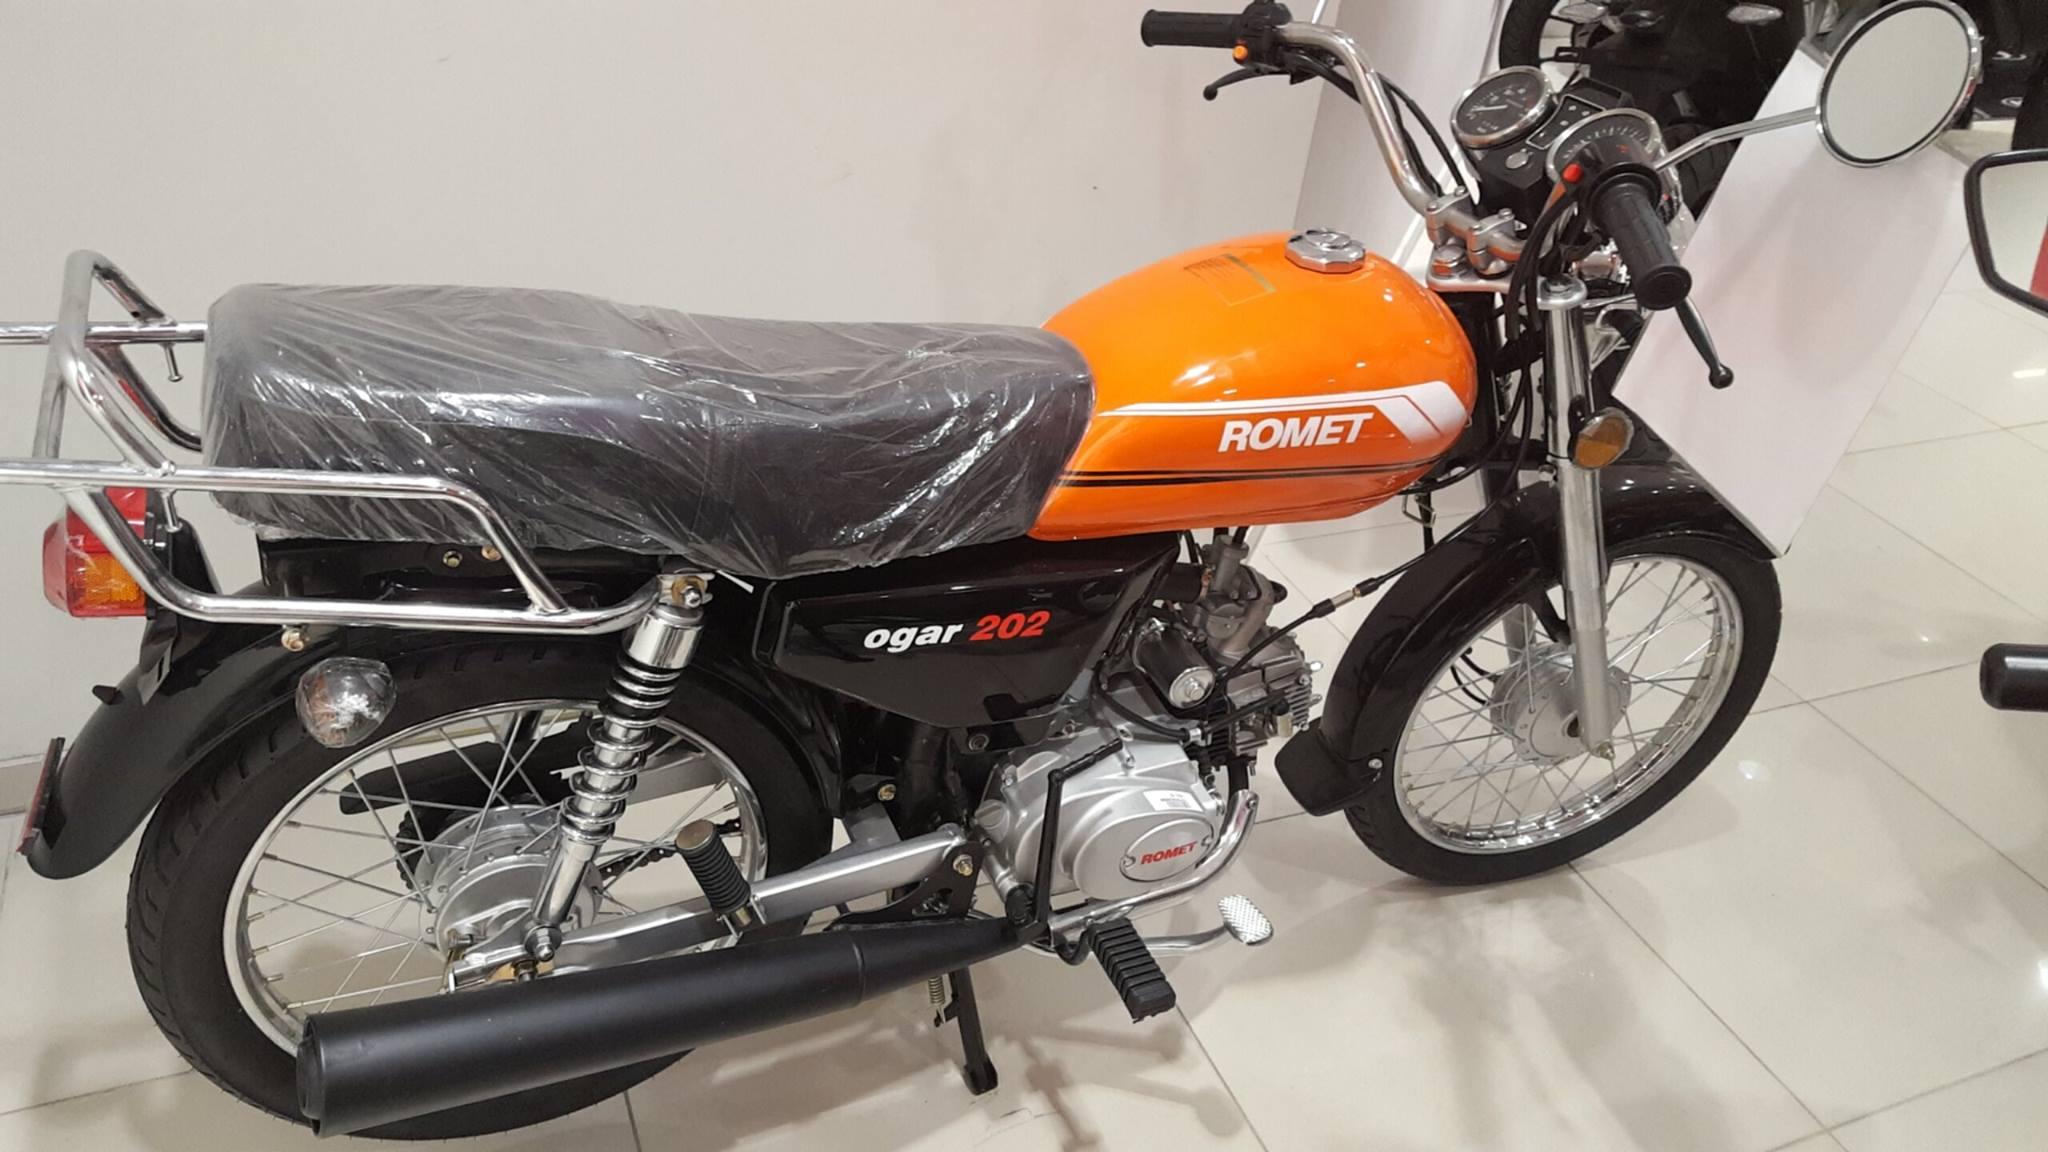 romet ogar 202 50 4t euro 4 visatex skutery motocykle. Black Bedroom Furniture Sets. Home Design Ideas